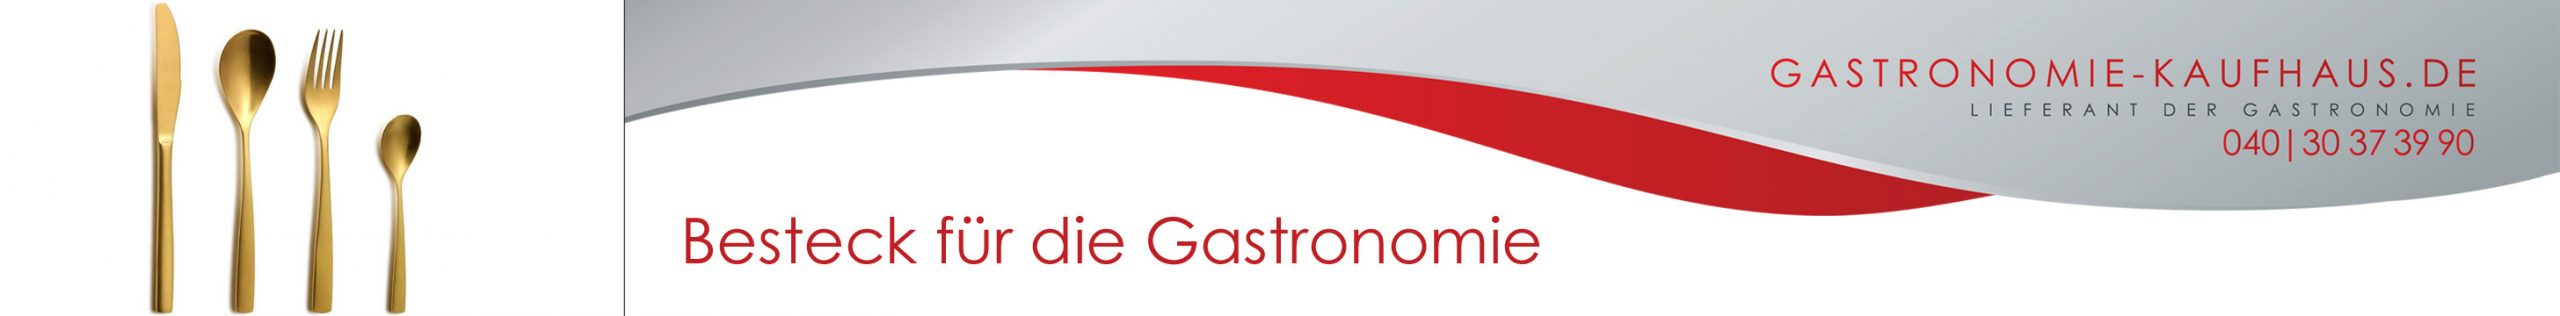 Comas Besteck - Gastronomie-Kaufhaus